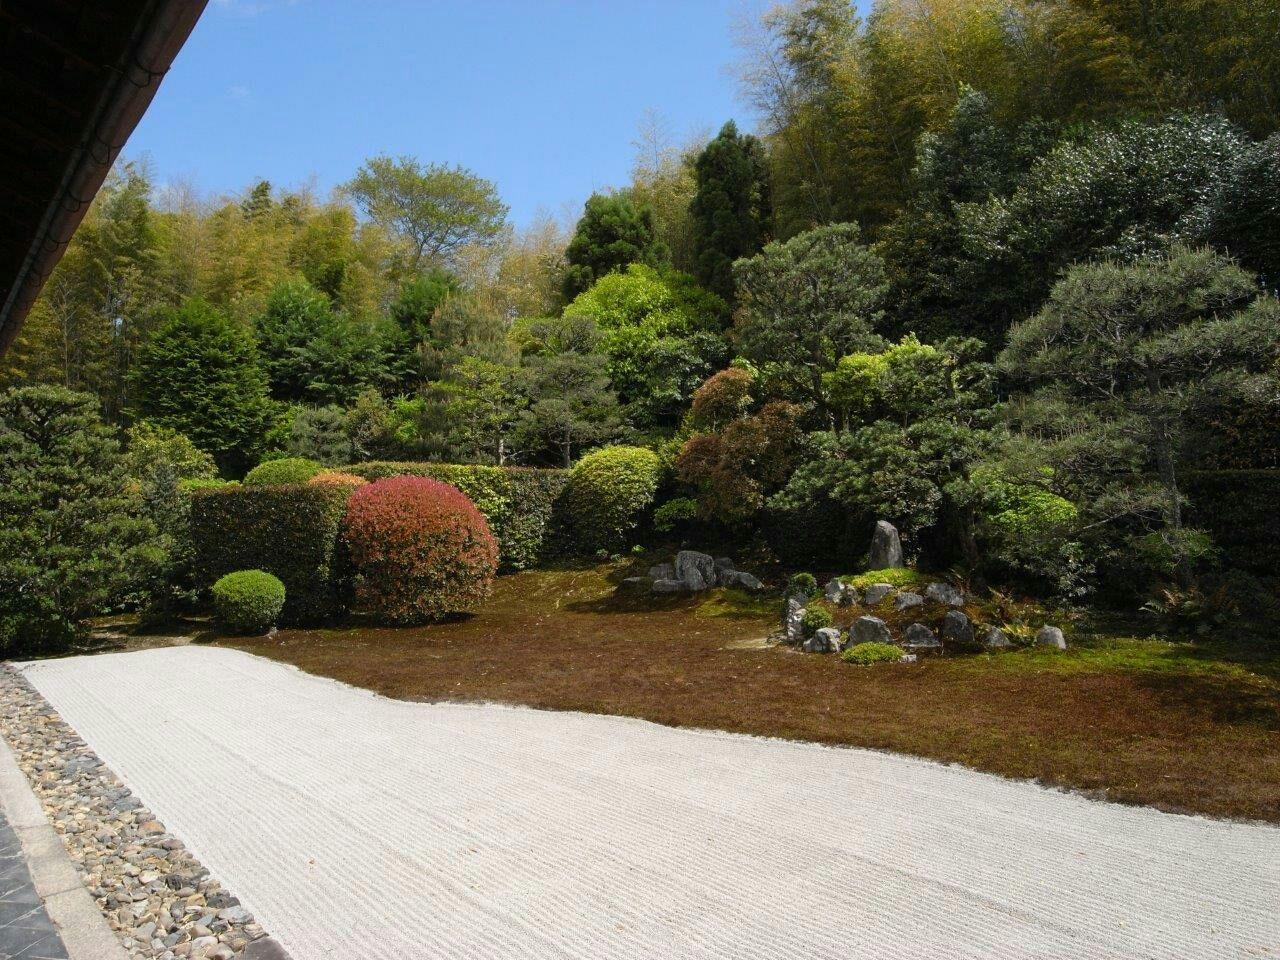 芬陀院 : 京都庭園blog